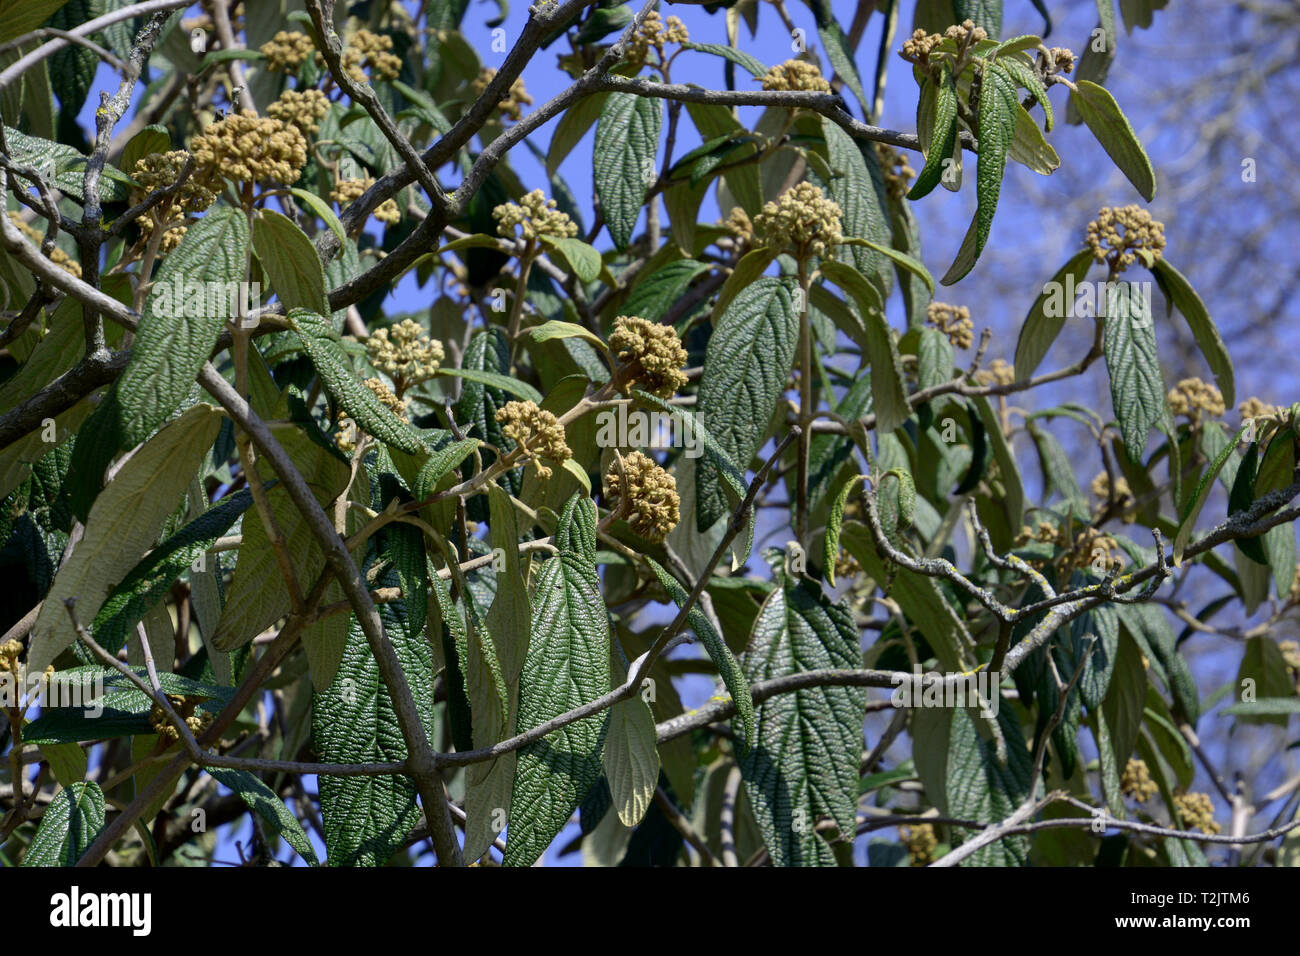 viburnum rhytidophyllum shrub also called leatherleaf viburnum a spring season at lake constance, flowering viburnum in spring with yellow closed flow - Stock Image